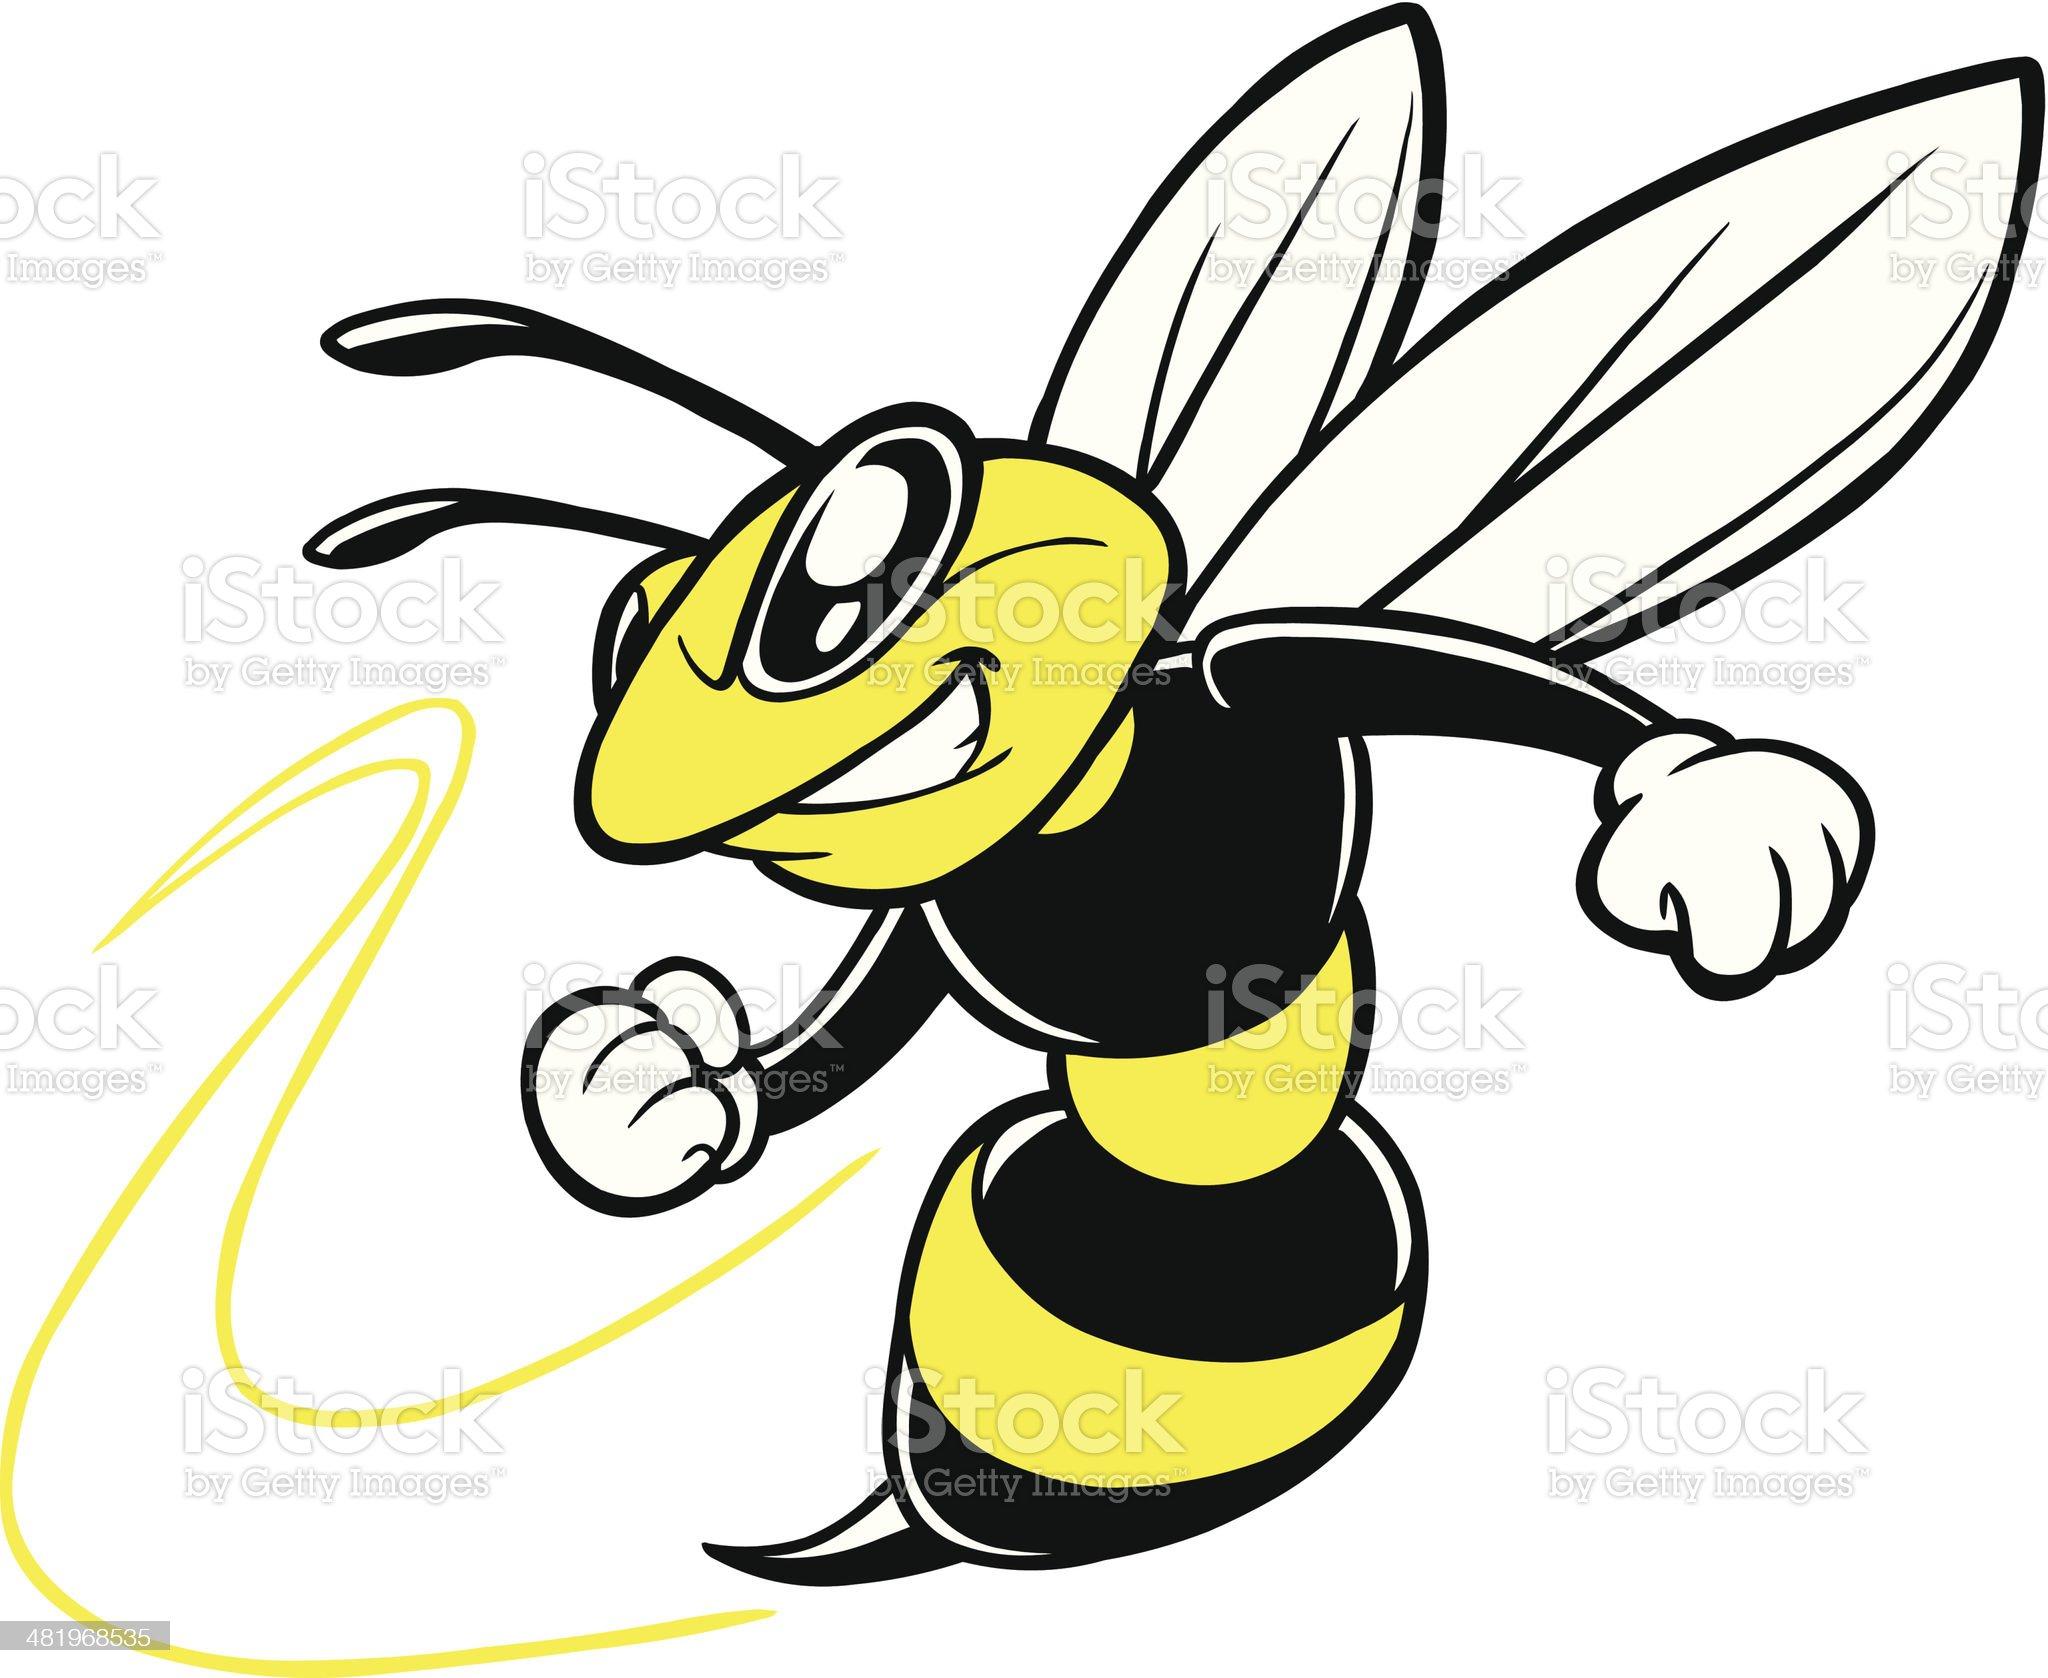 Bee Team Mascot royalty-free stock vector art